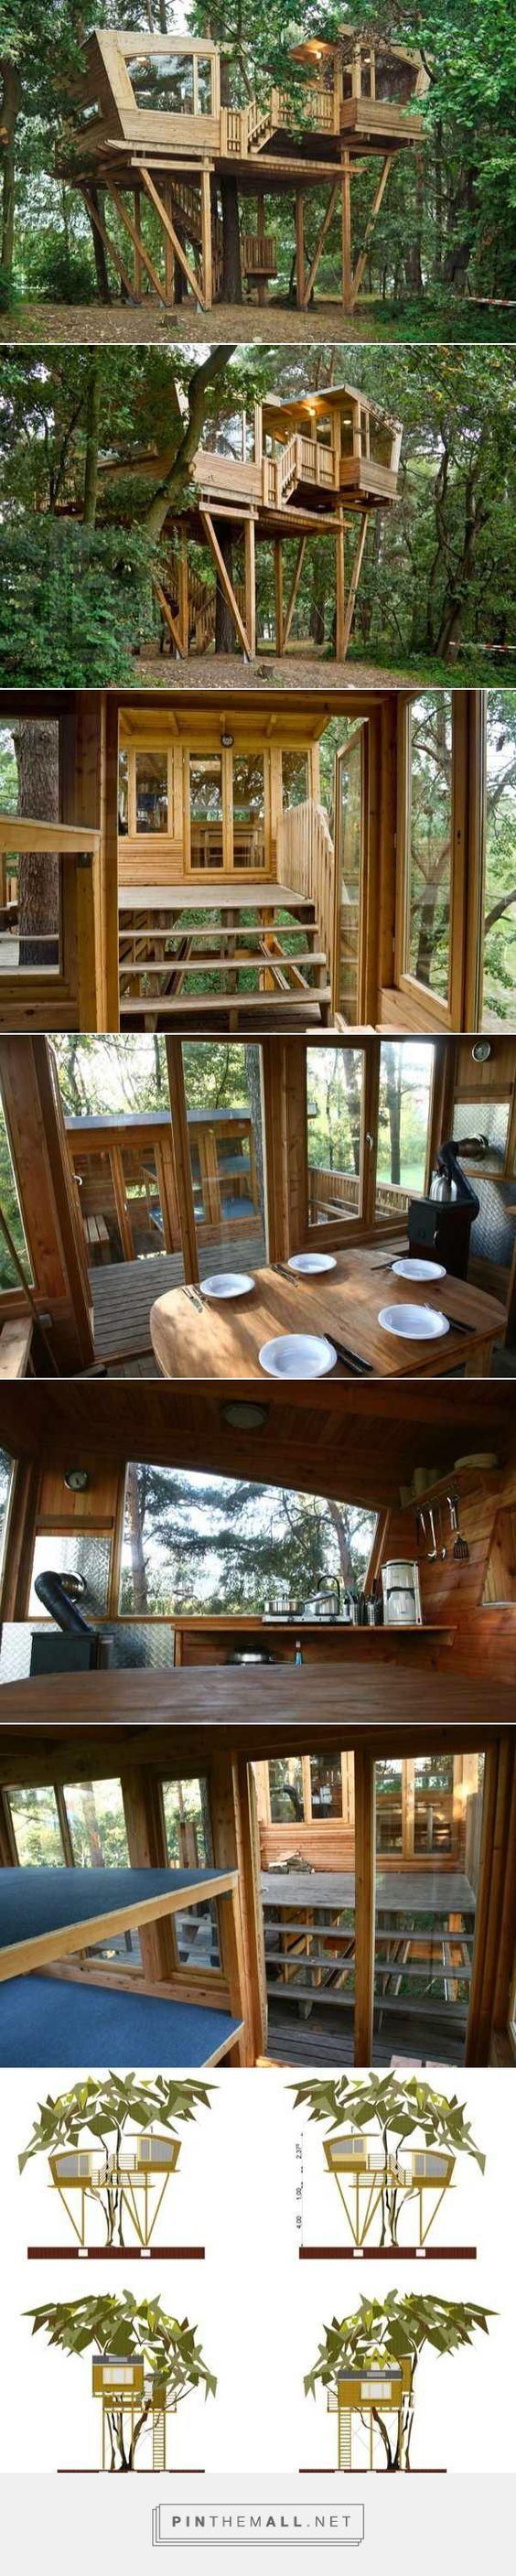 210 Sq. Ft. Modern Treehouse Tiny Home - created via https://pinthemall.net